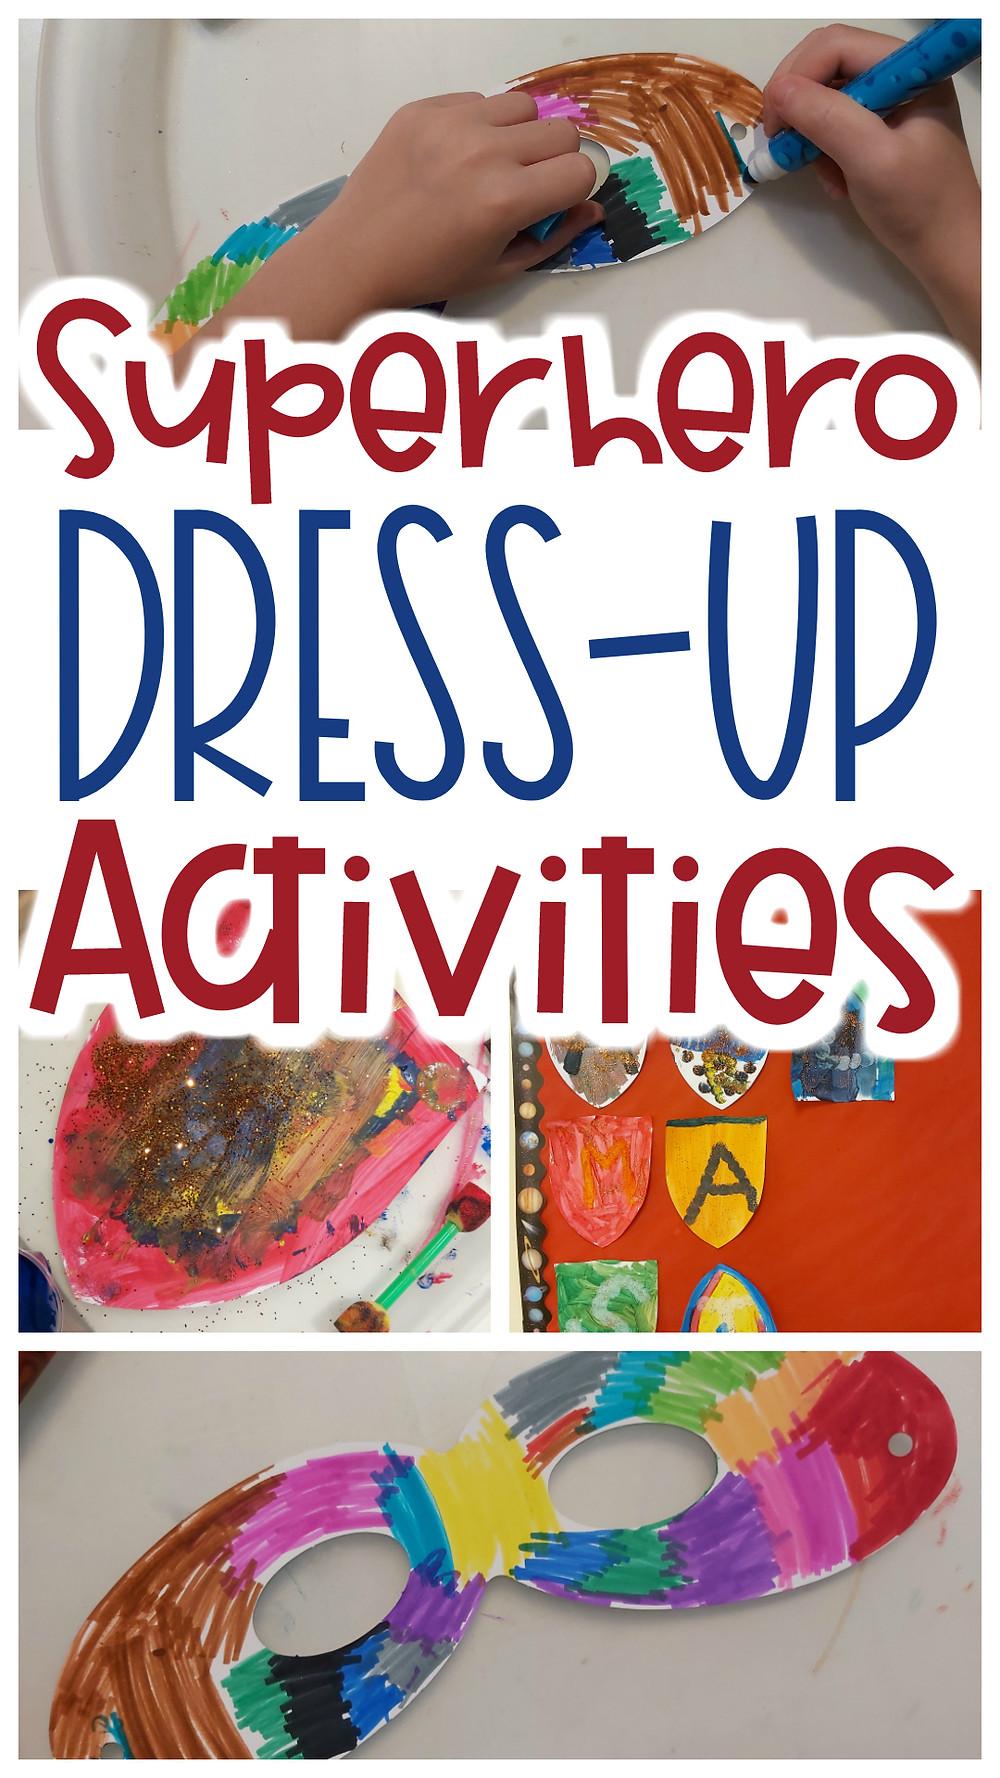 collage of preschool superhero crafts with text: Superhero Dress-Up Activities